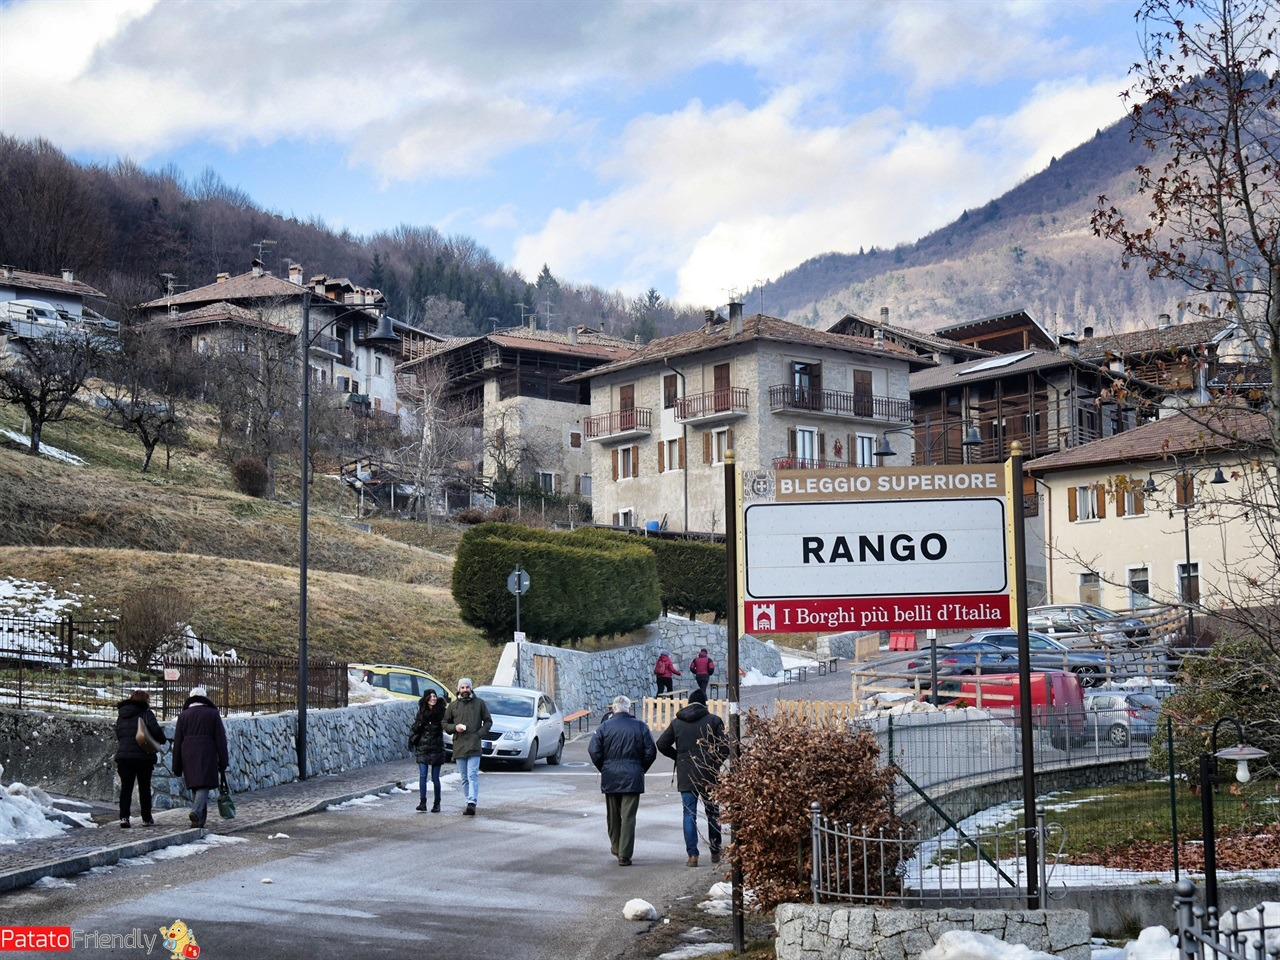 [cml_media_alt id='15832']Mercatini di Rango - mercatini di Natale in Trentino[/cml_media_alt]